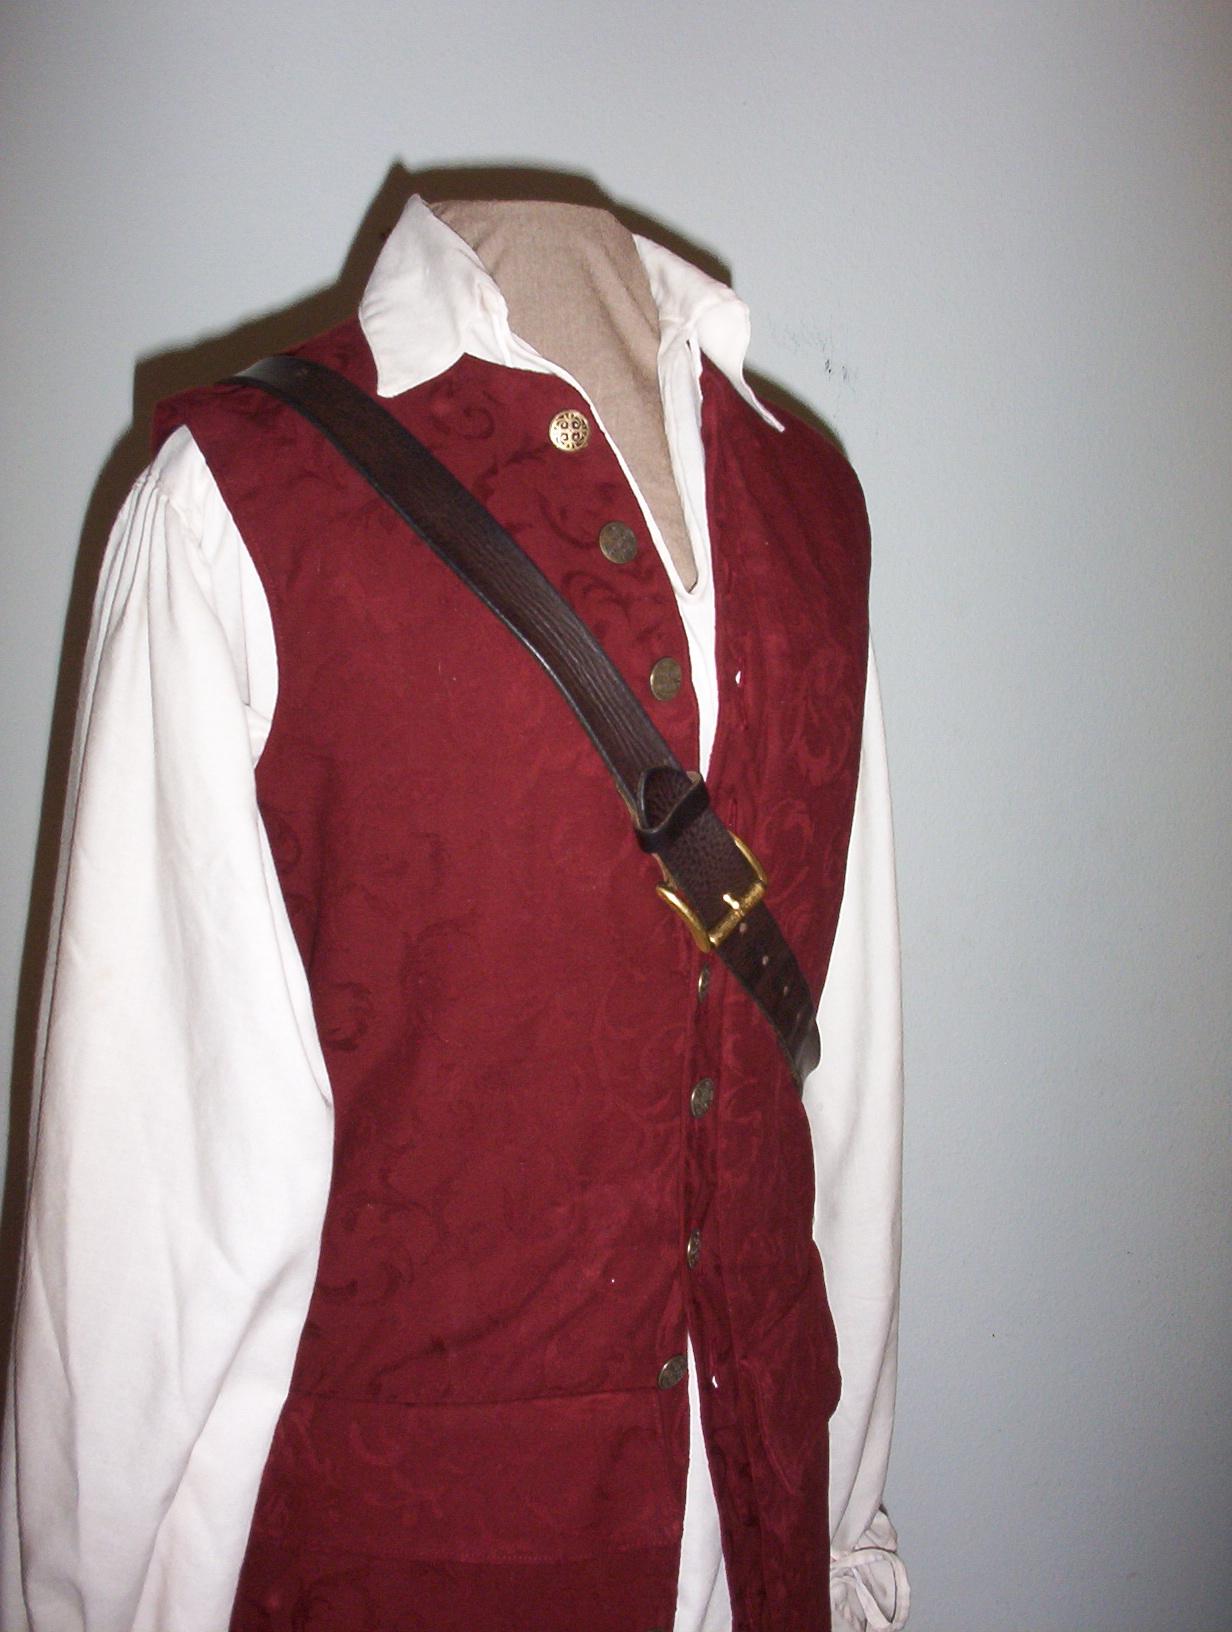 Pirate costume2 3009 (2).jpg